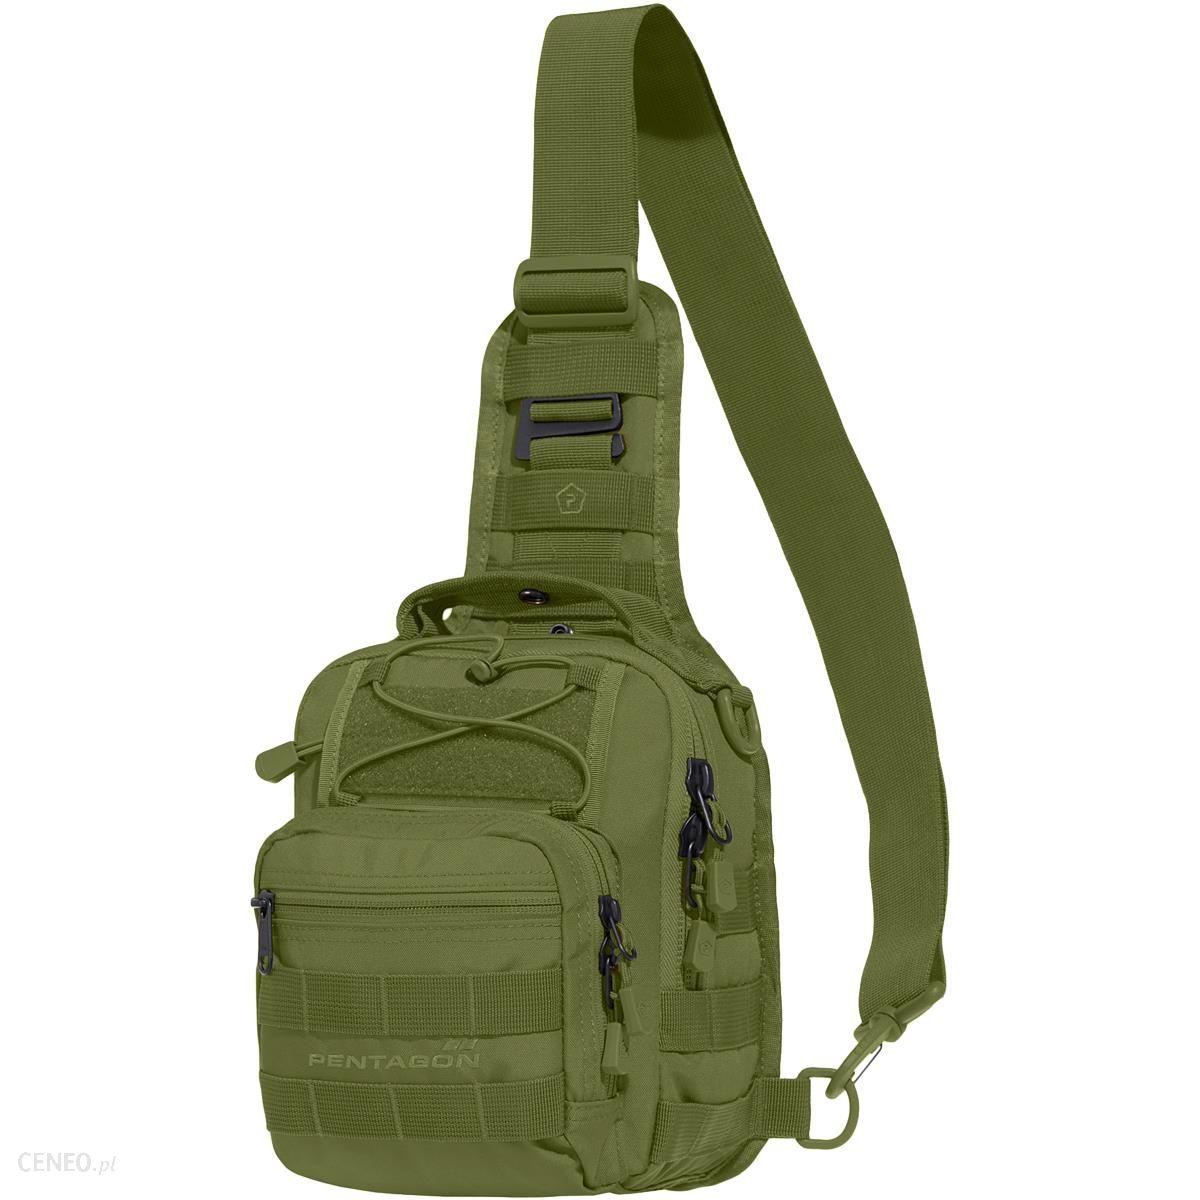 Pentagon Torba Ucb 2.0 Universal Chest Bag Oliwkowa